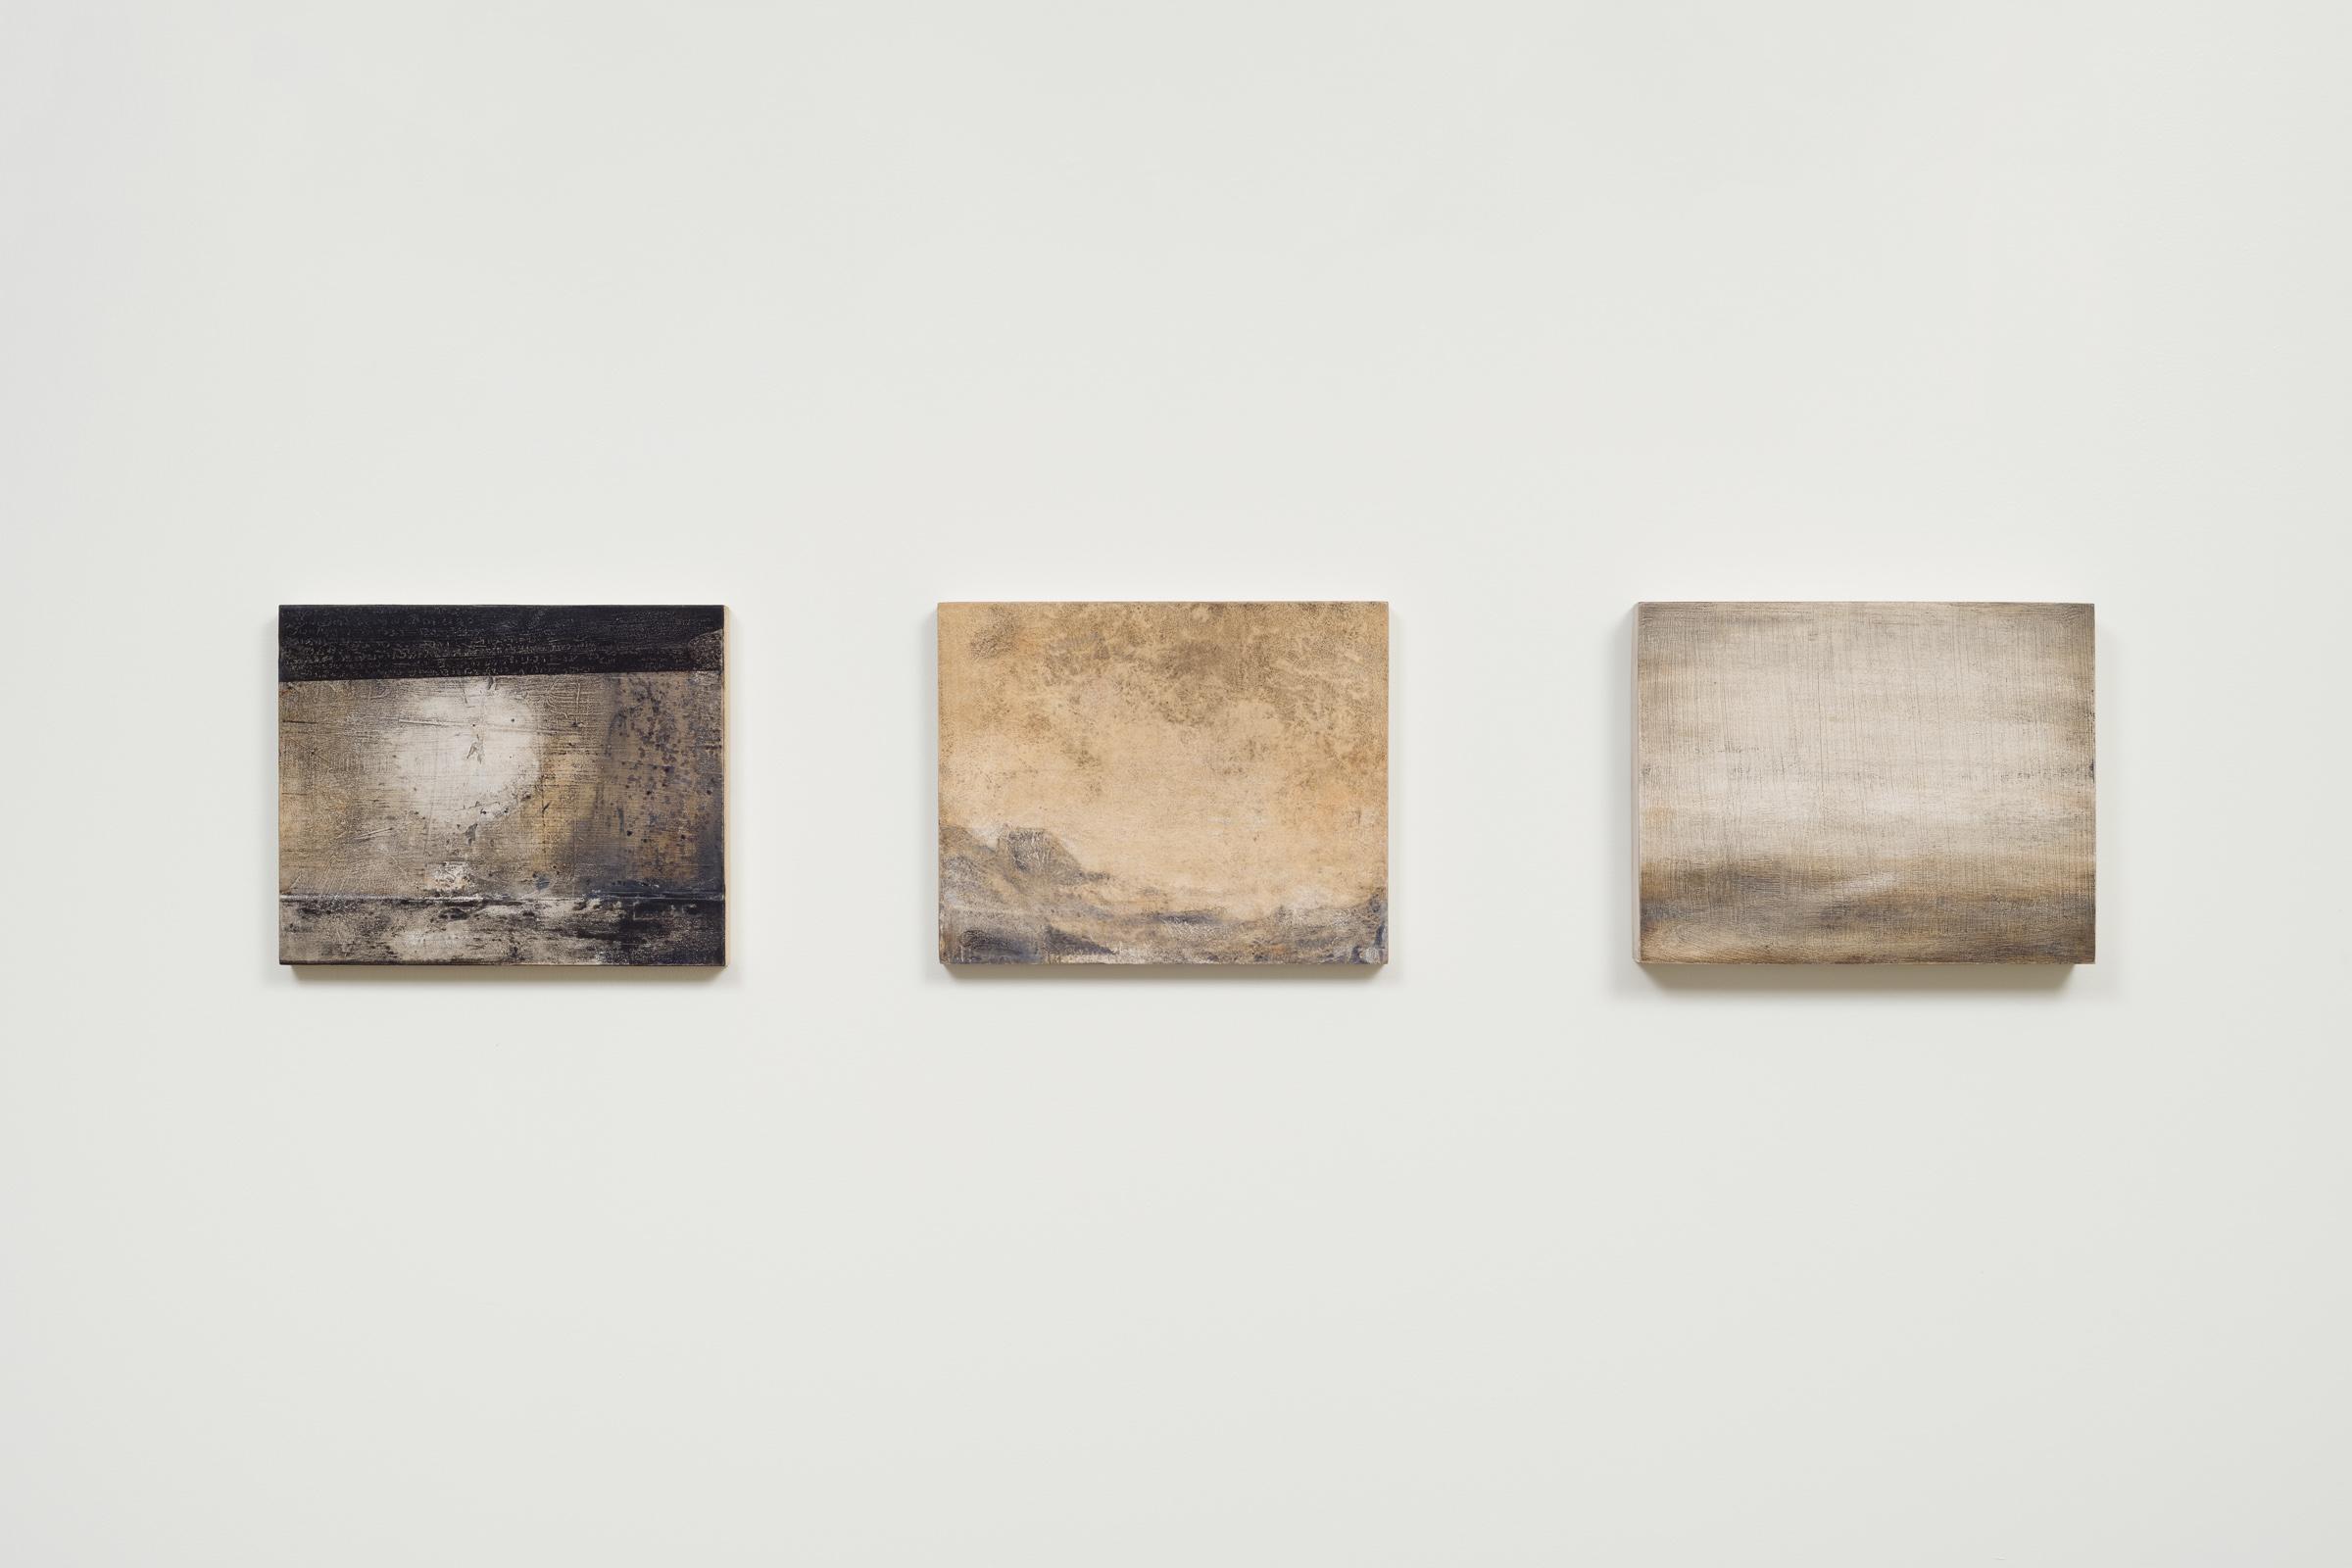 Herbert-Pfostl-Oil-Paintings.jpg